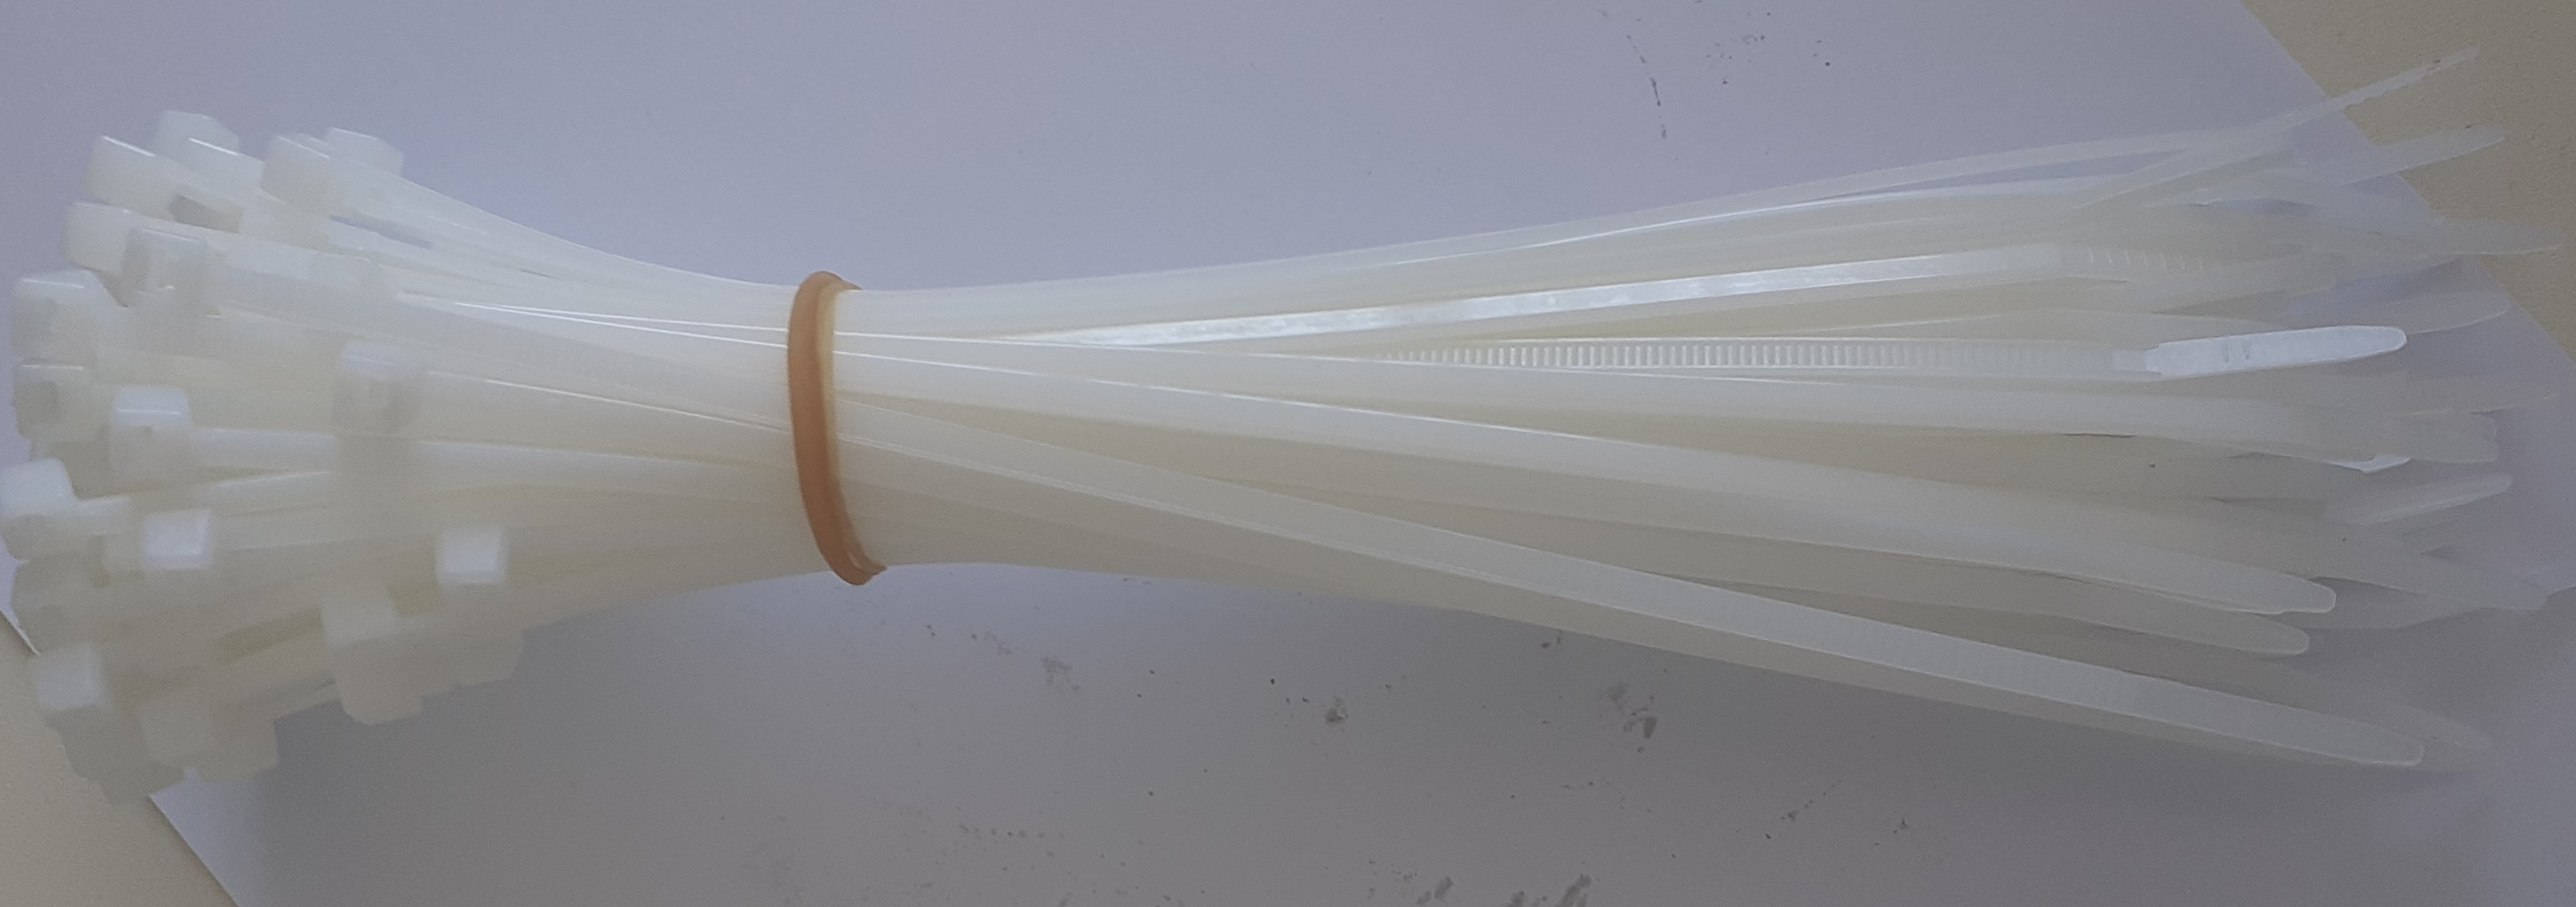 COLIER PLASTIC 1*2,5*100MM,100BUC,GRANIT